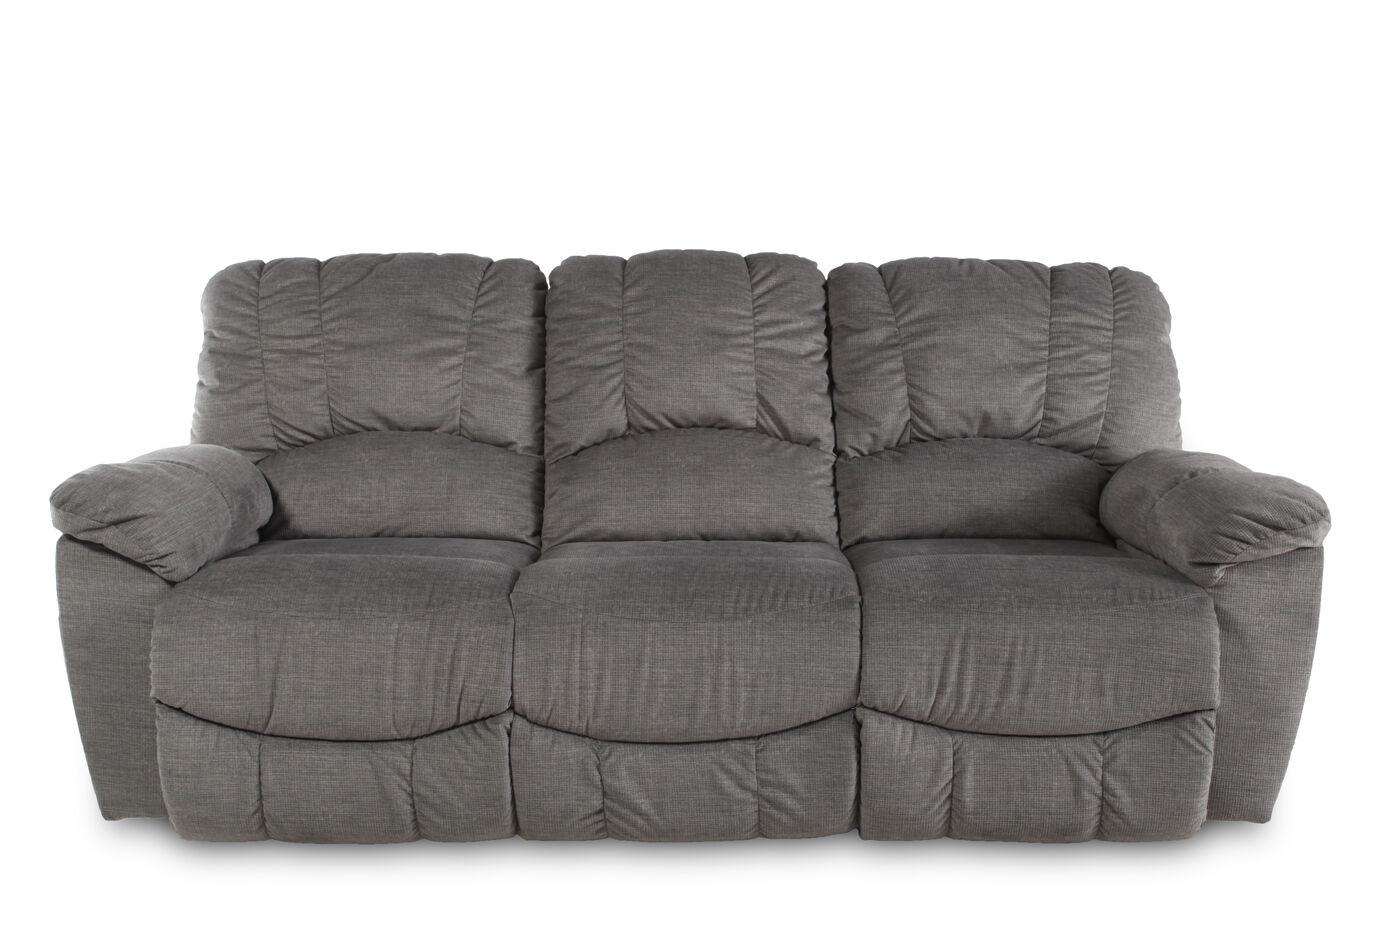 Lazy Boy Dual Reclining Sofa Briggs La Z Time Full